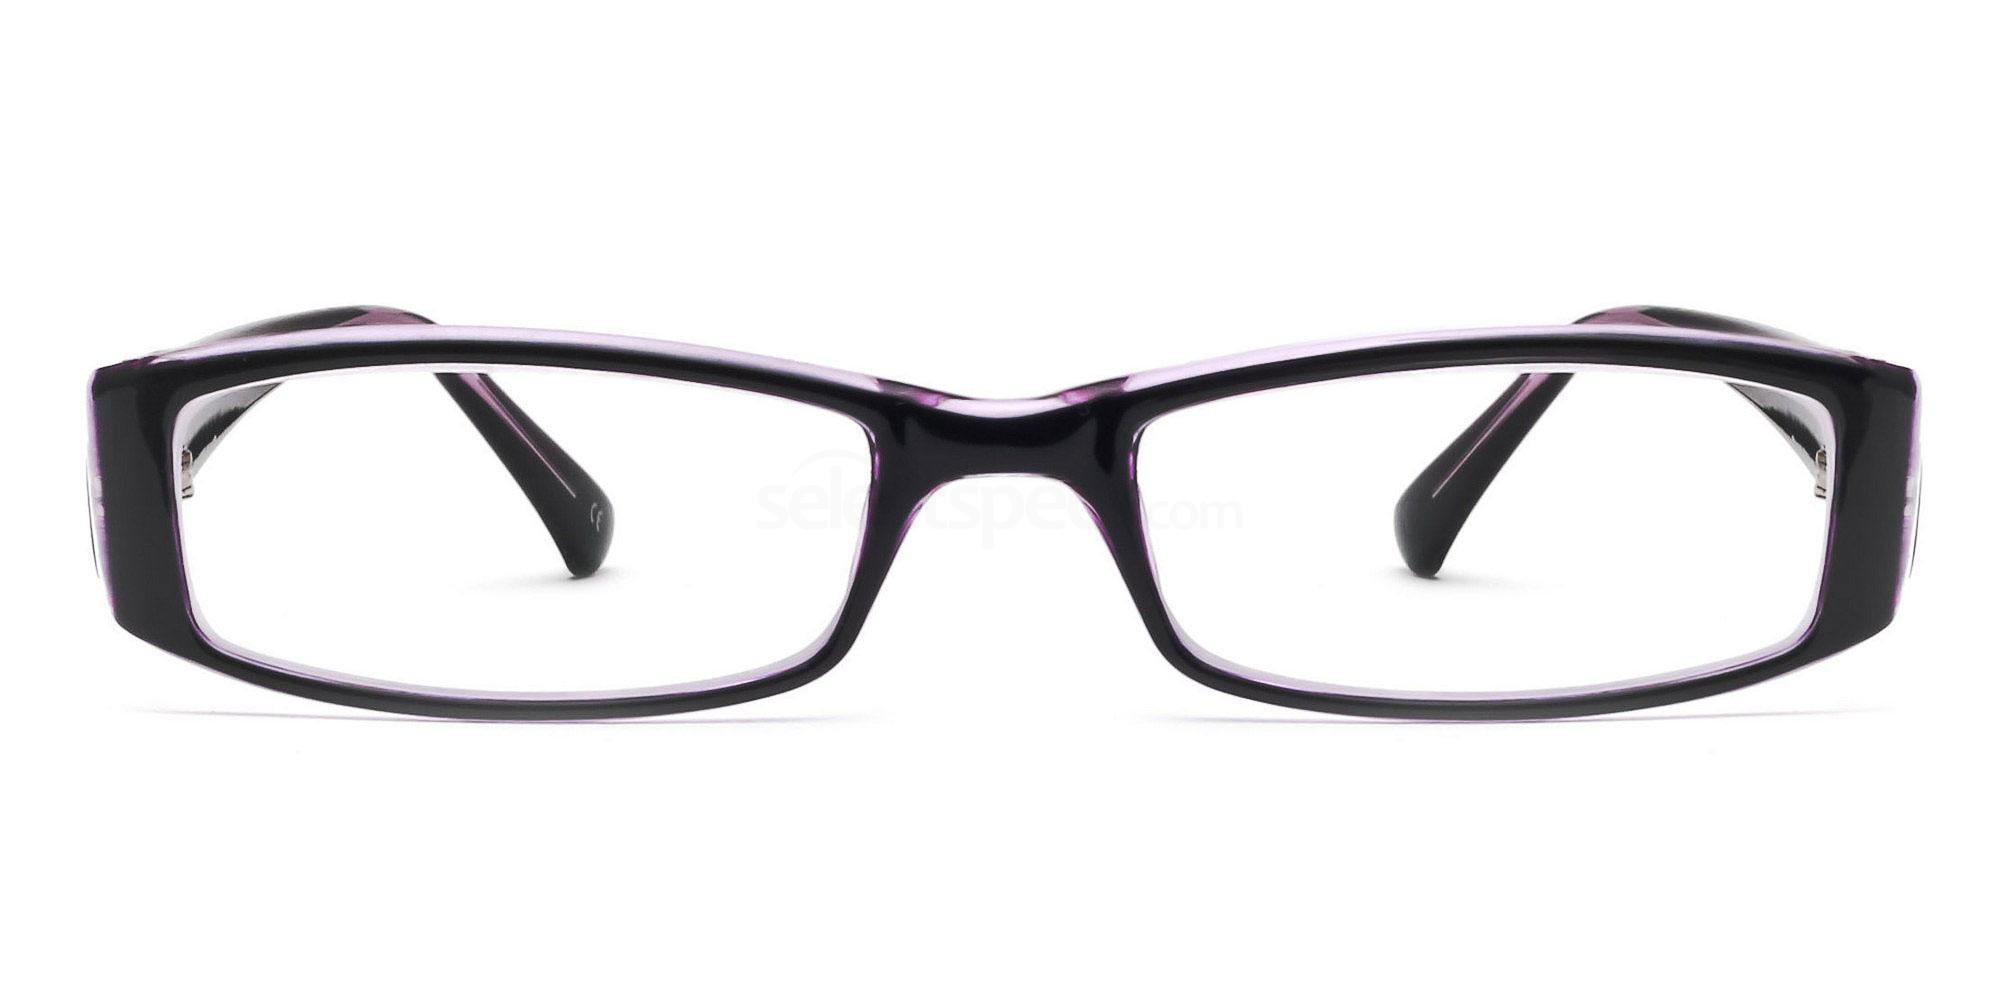 C44 P2251 - Black and Purple Glasses, SelectSpecs